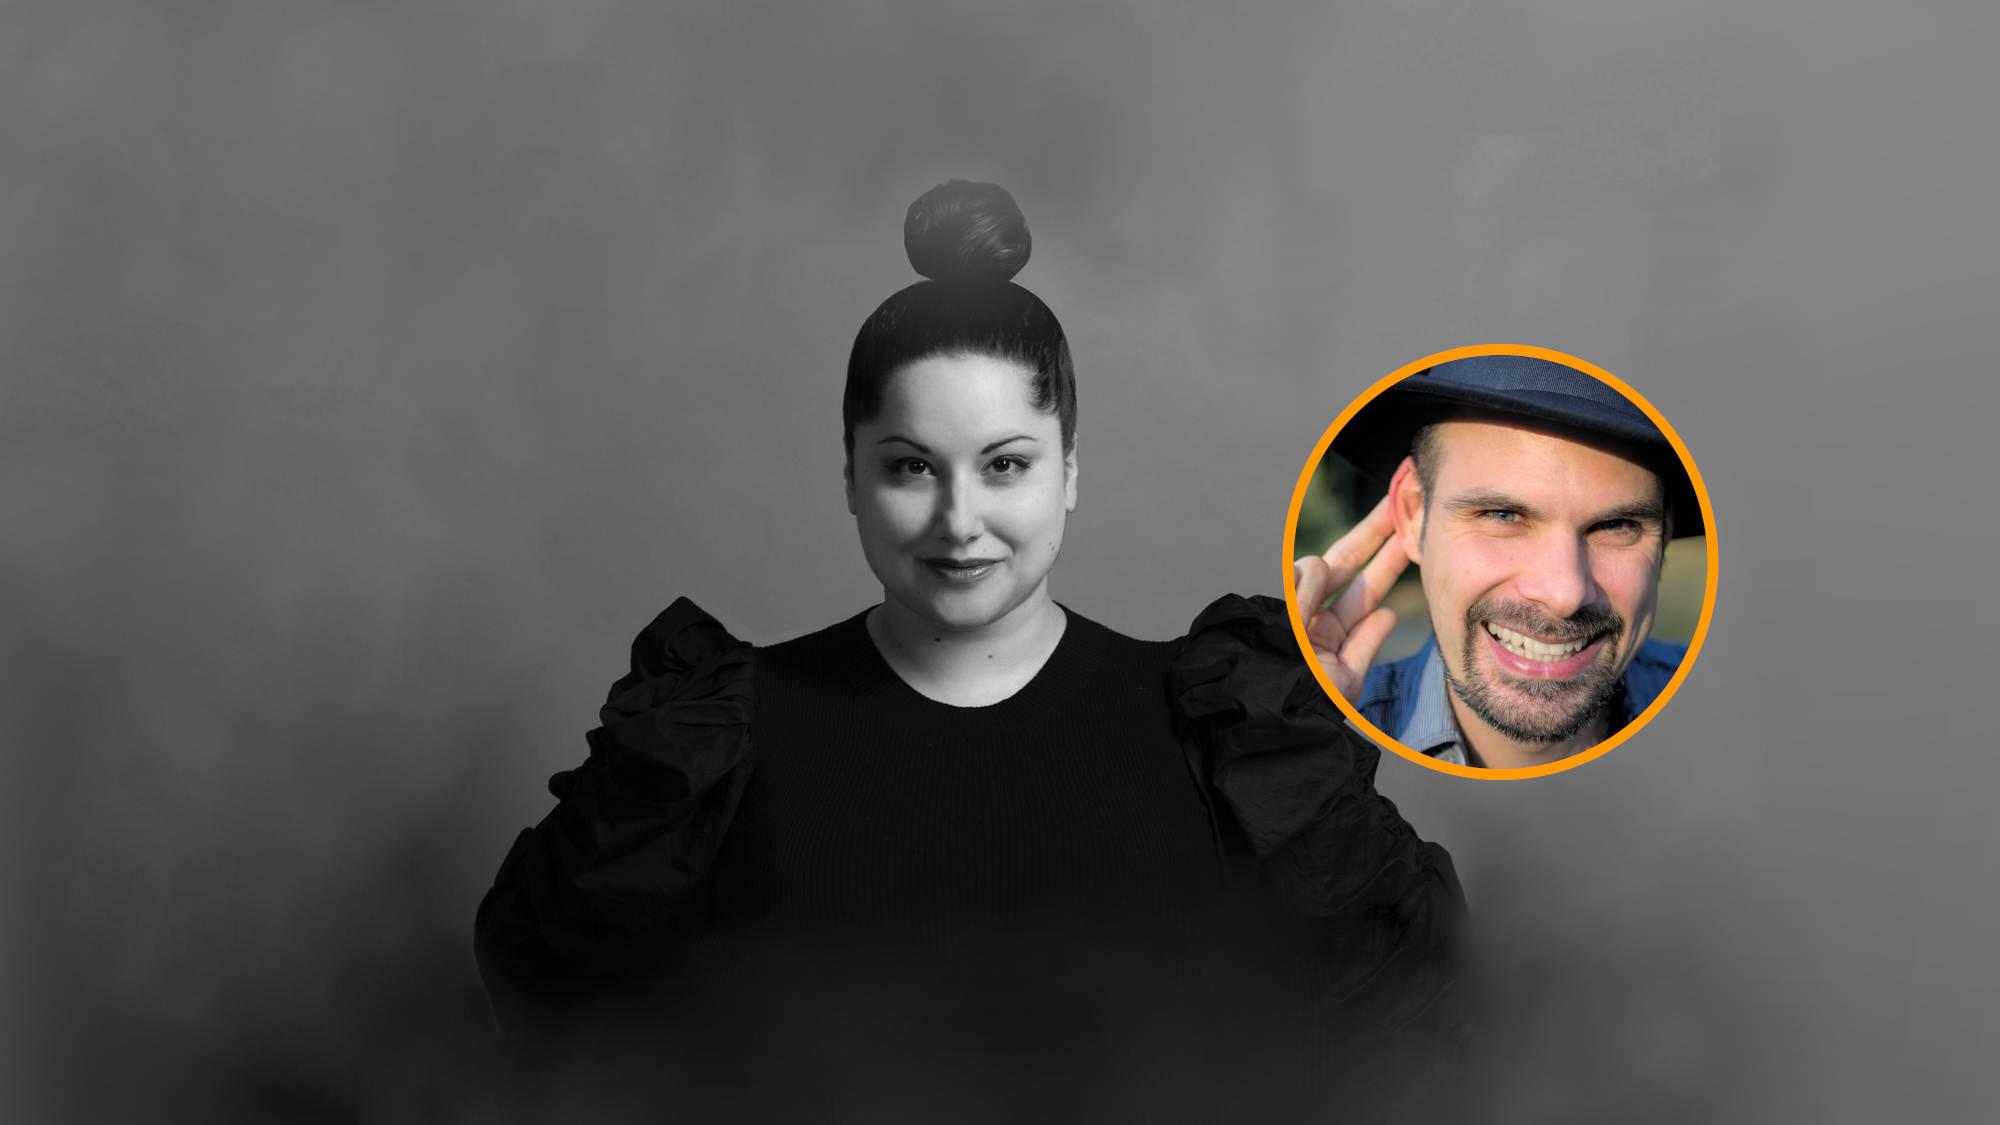 Discovering People Podcast: Mariam nimmt das Stigma von Horror in Angriff » Brand Artery Blog » Webdesigner Saarbrücken · Fotografie · Copywriting · Storytelling